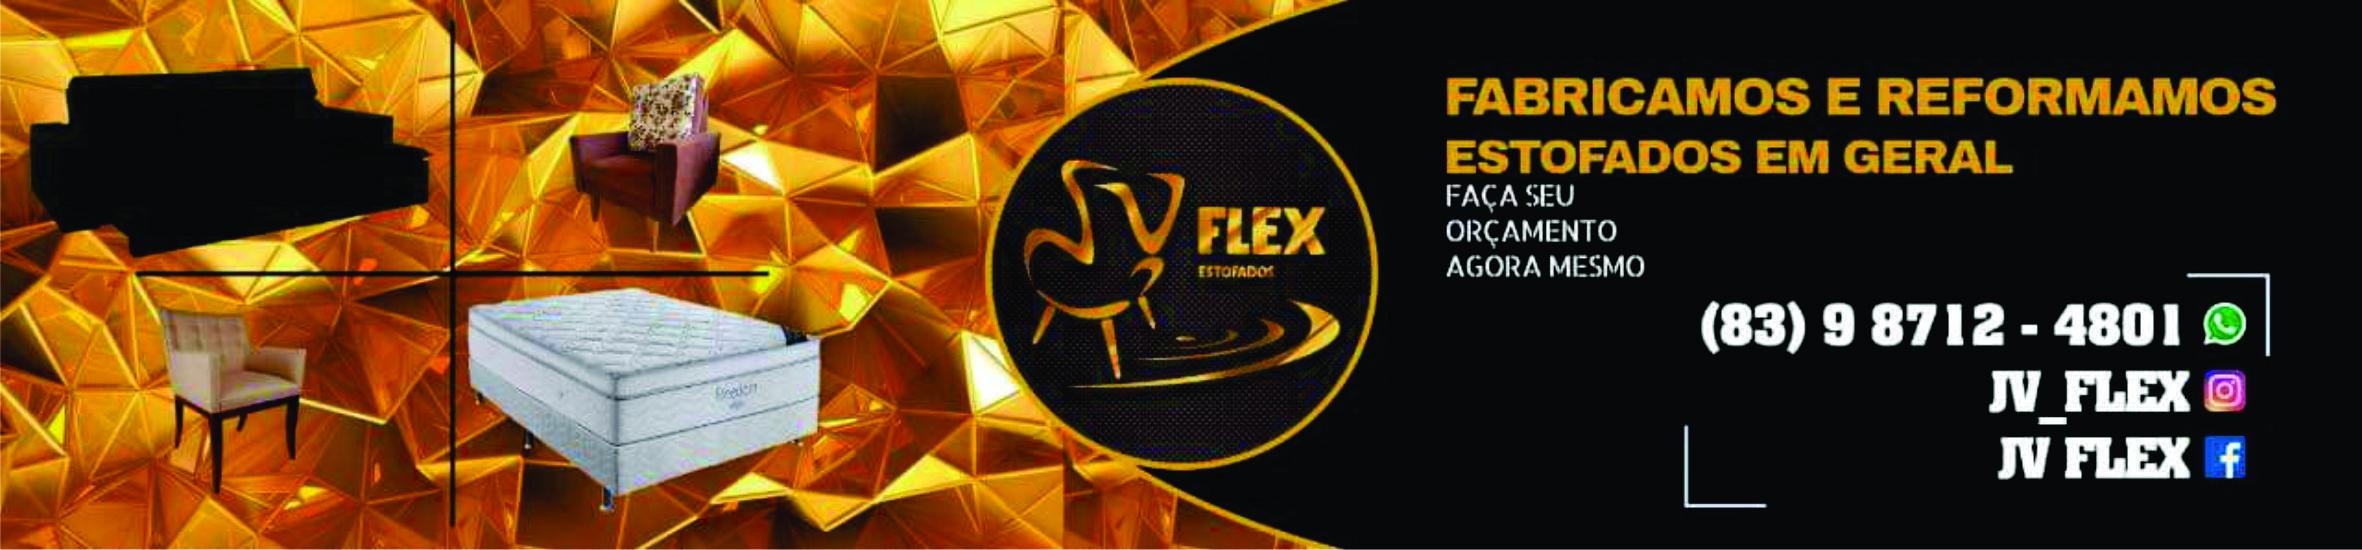 Flex estofados